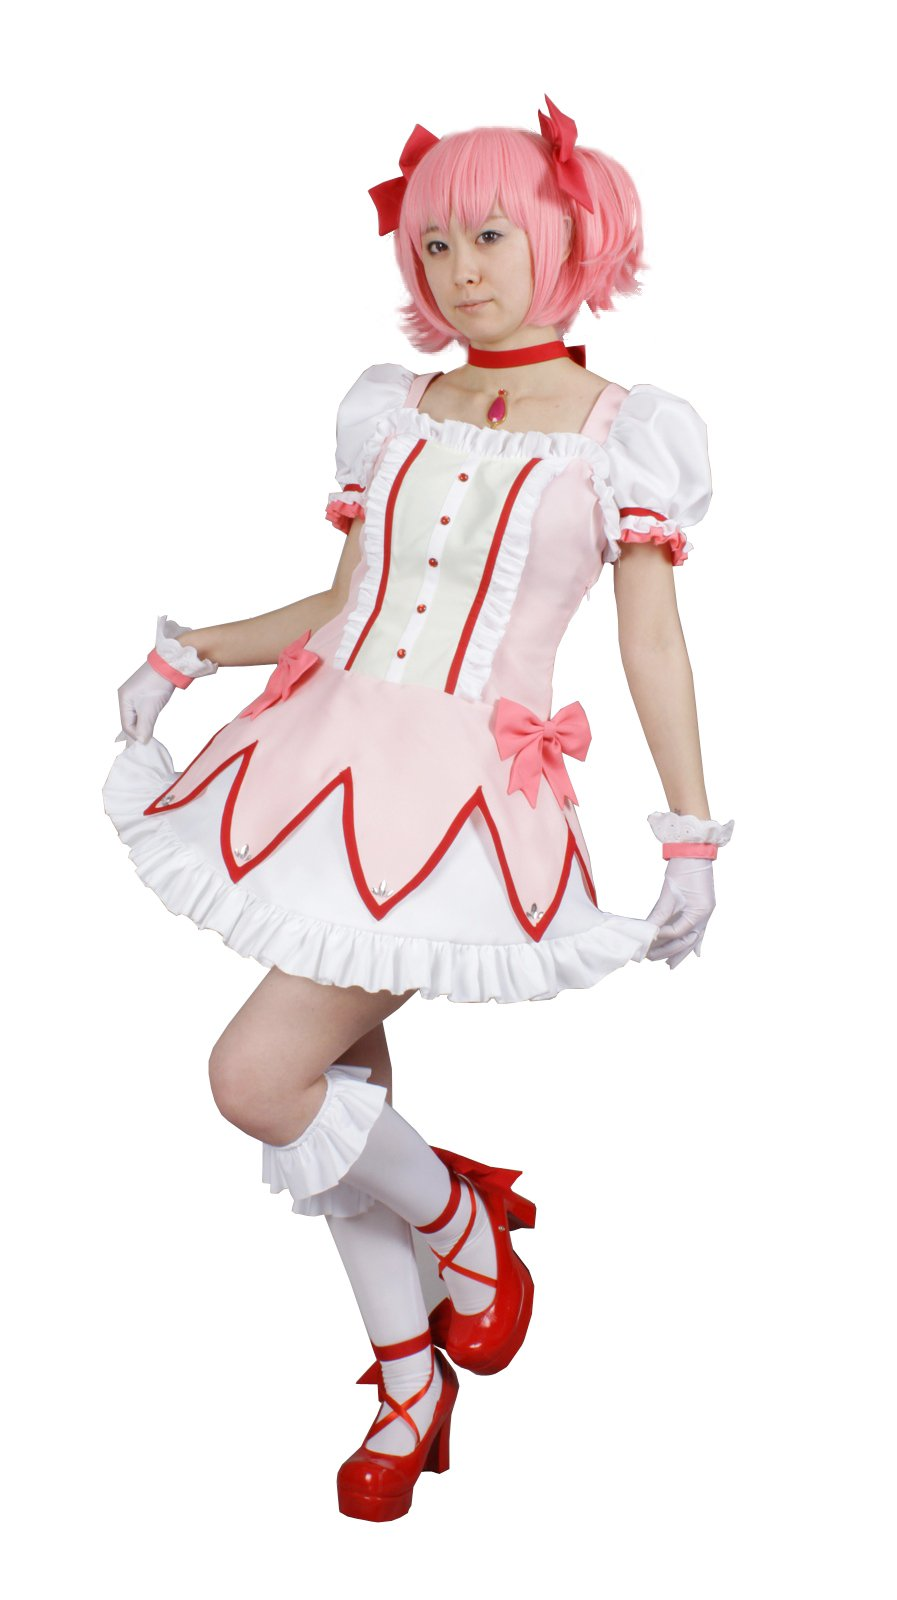 MILICA BOOKS Puella Magi Madoka Magica Madoka Kaname Cosplay Costume Size S